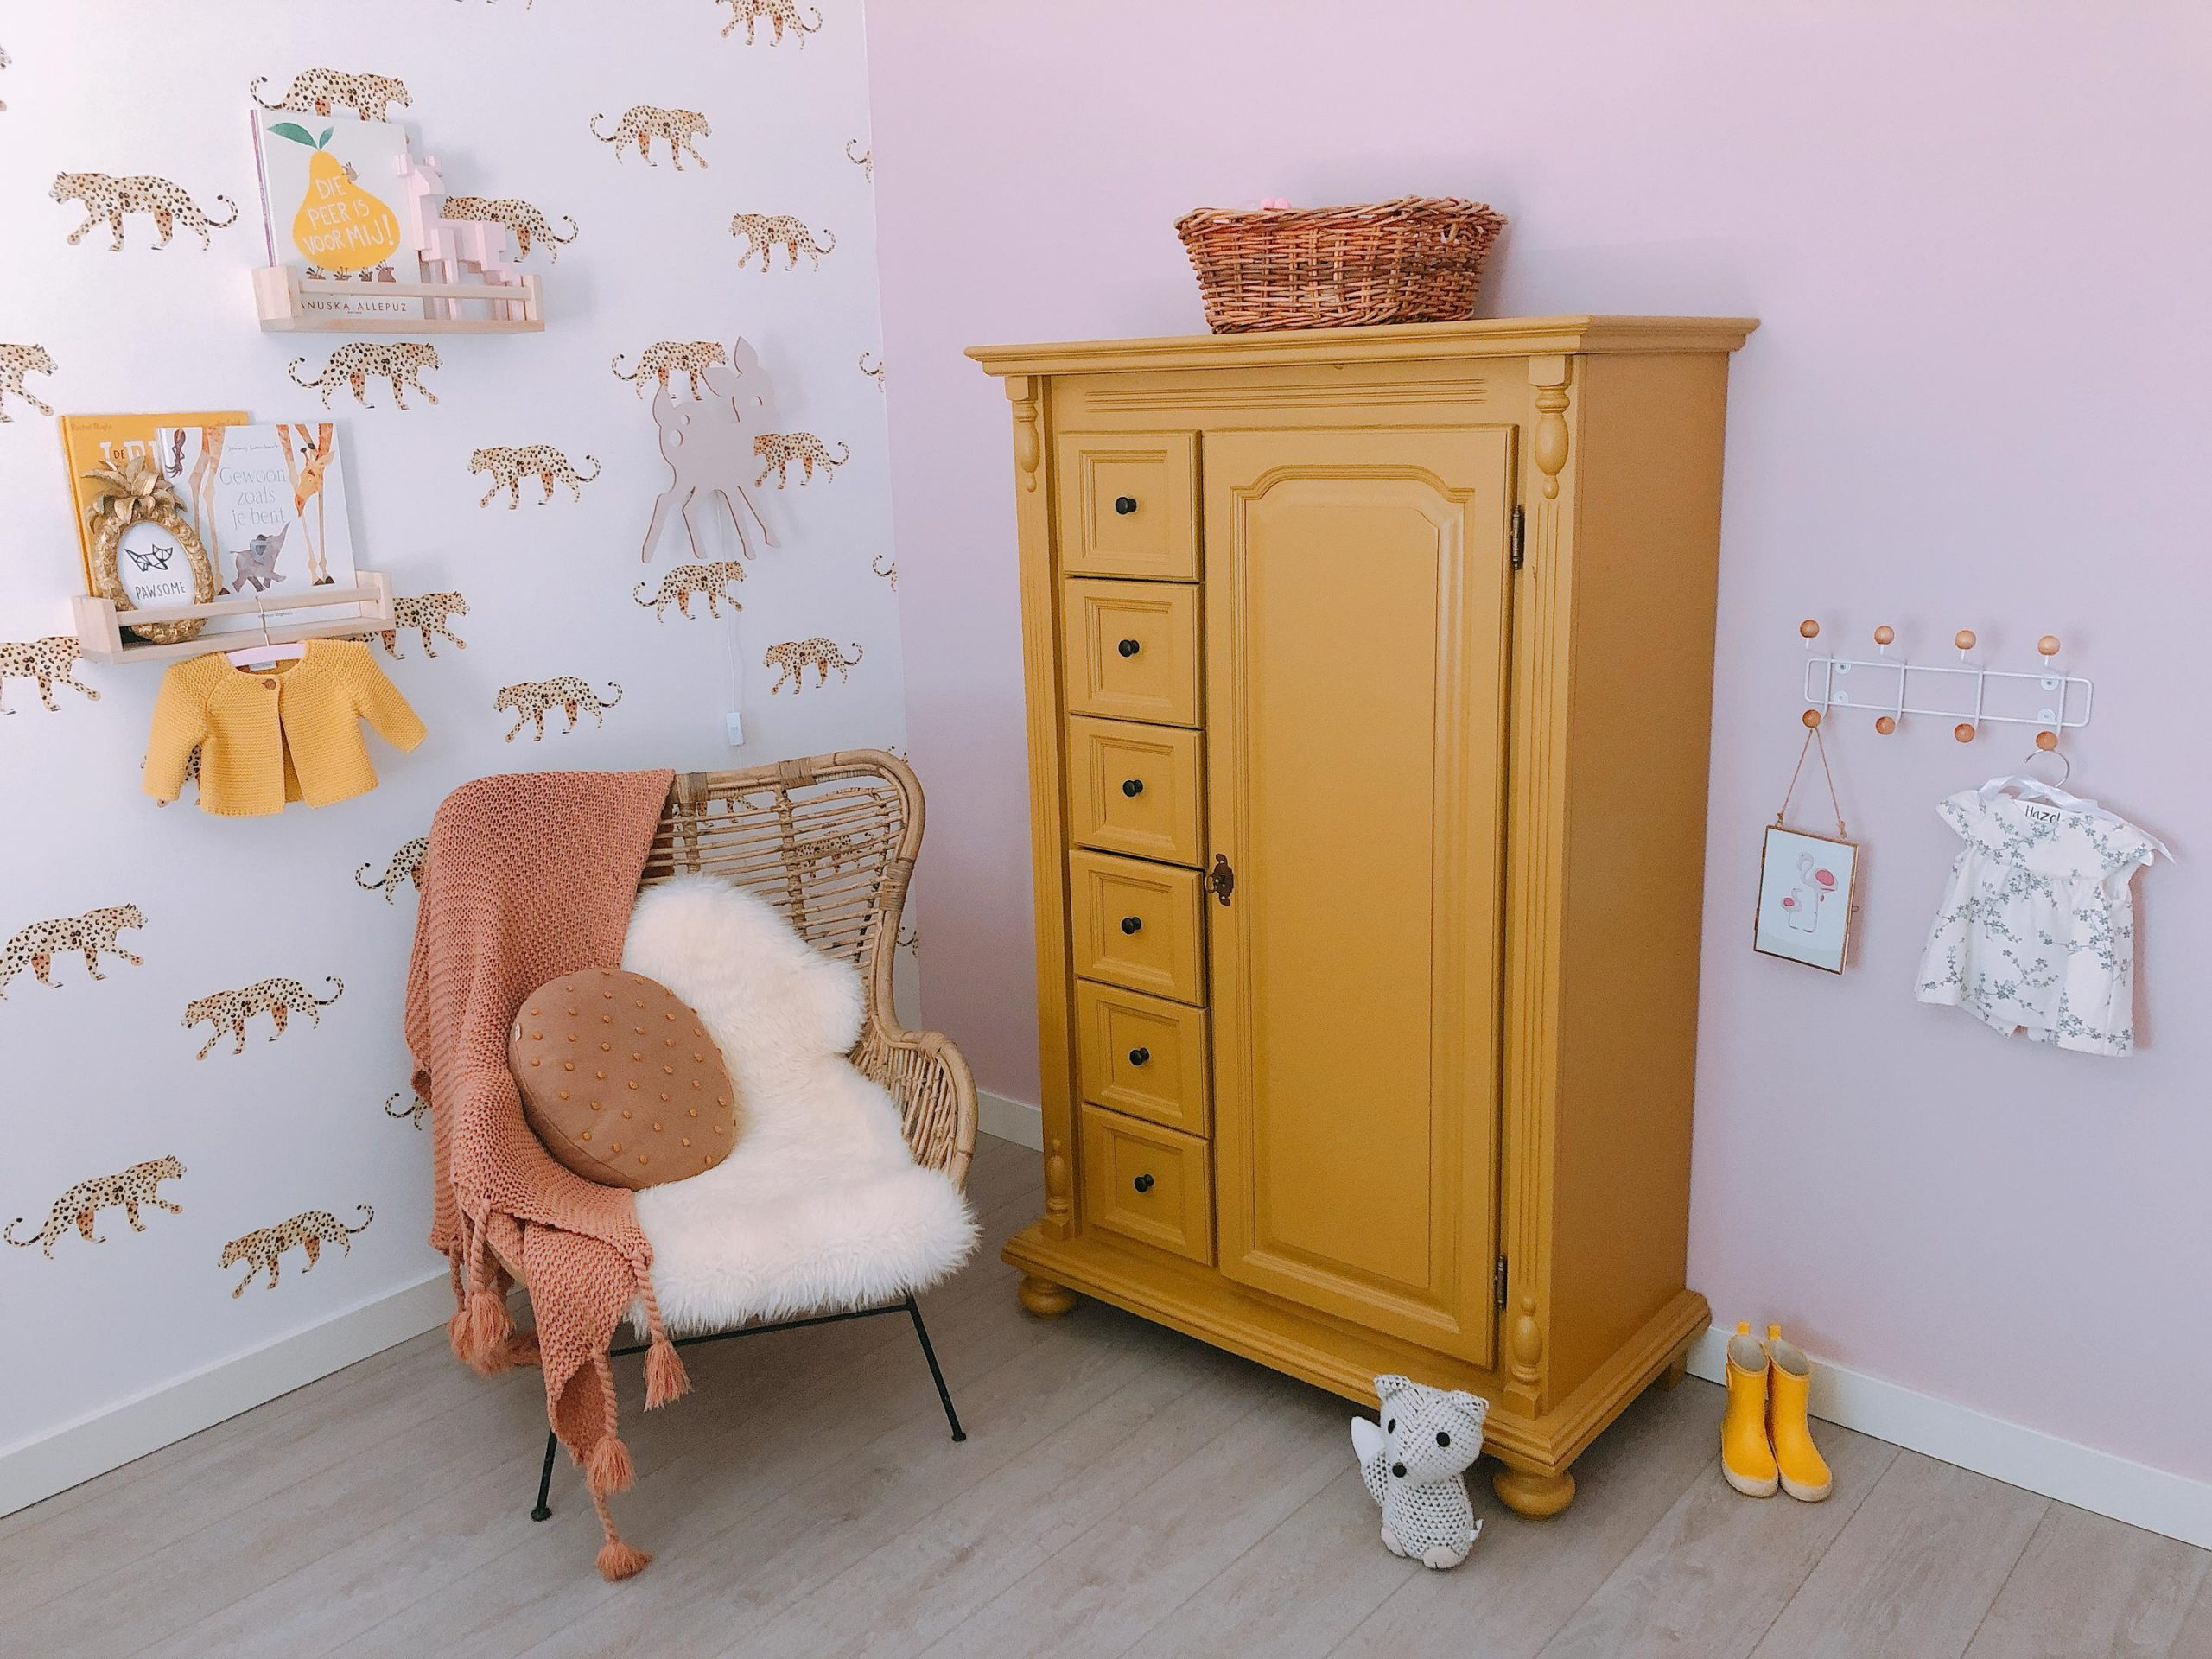 IMG 6958 2880x2160 1 scaled - De baby/kinderkamer van Hazel - roze, hout & marmer!